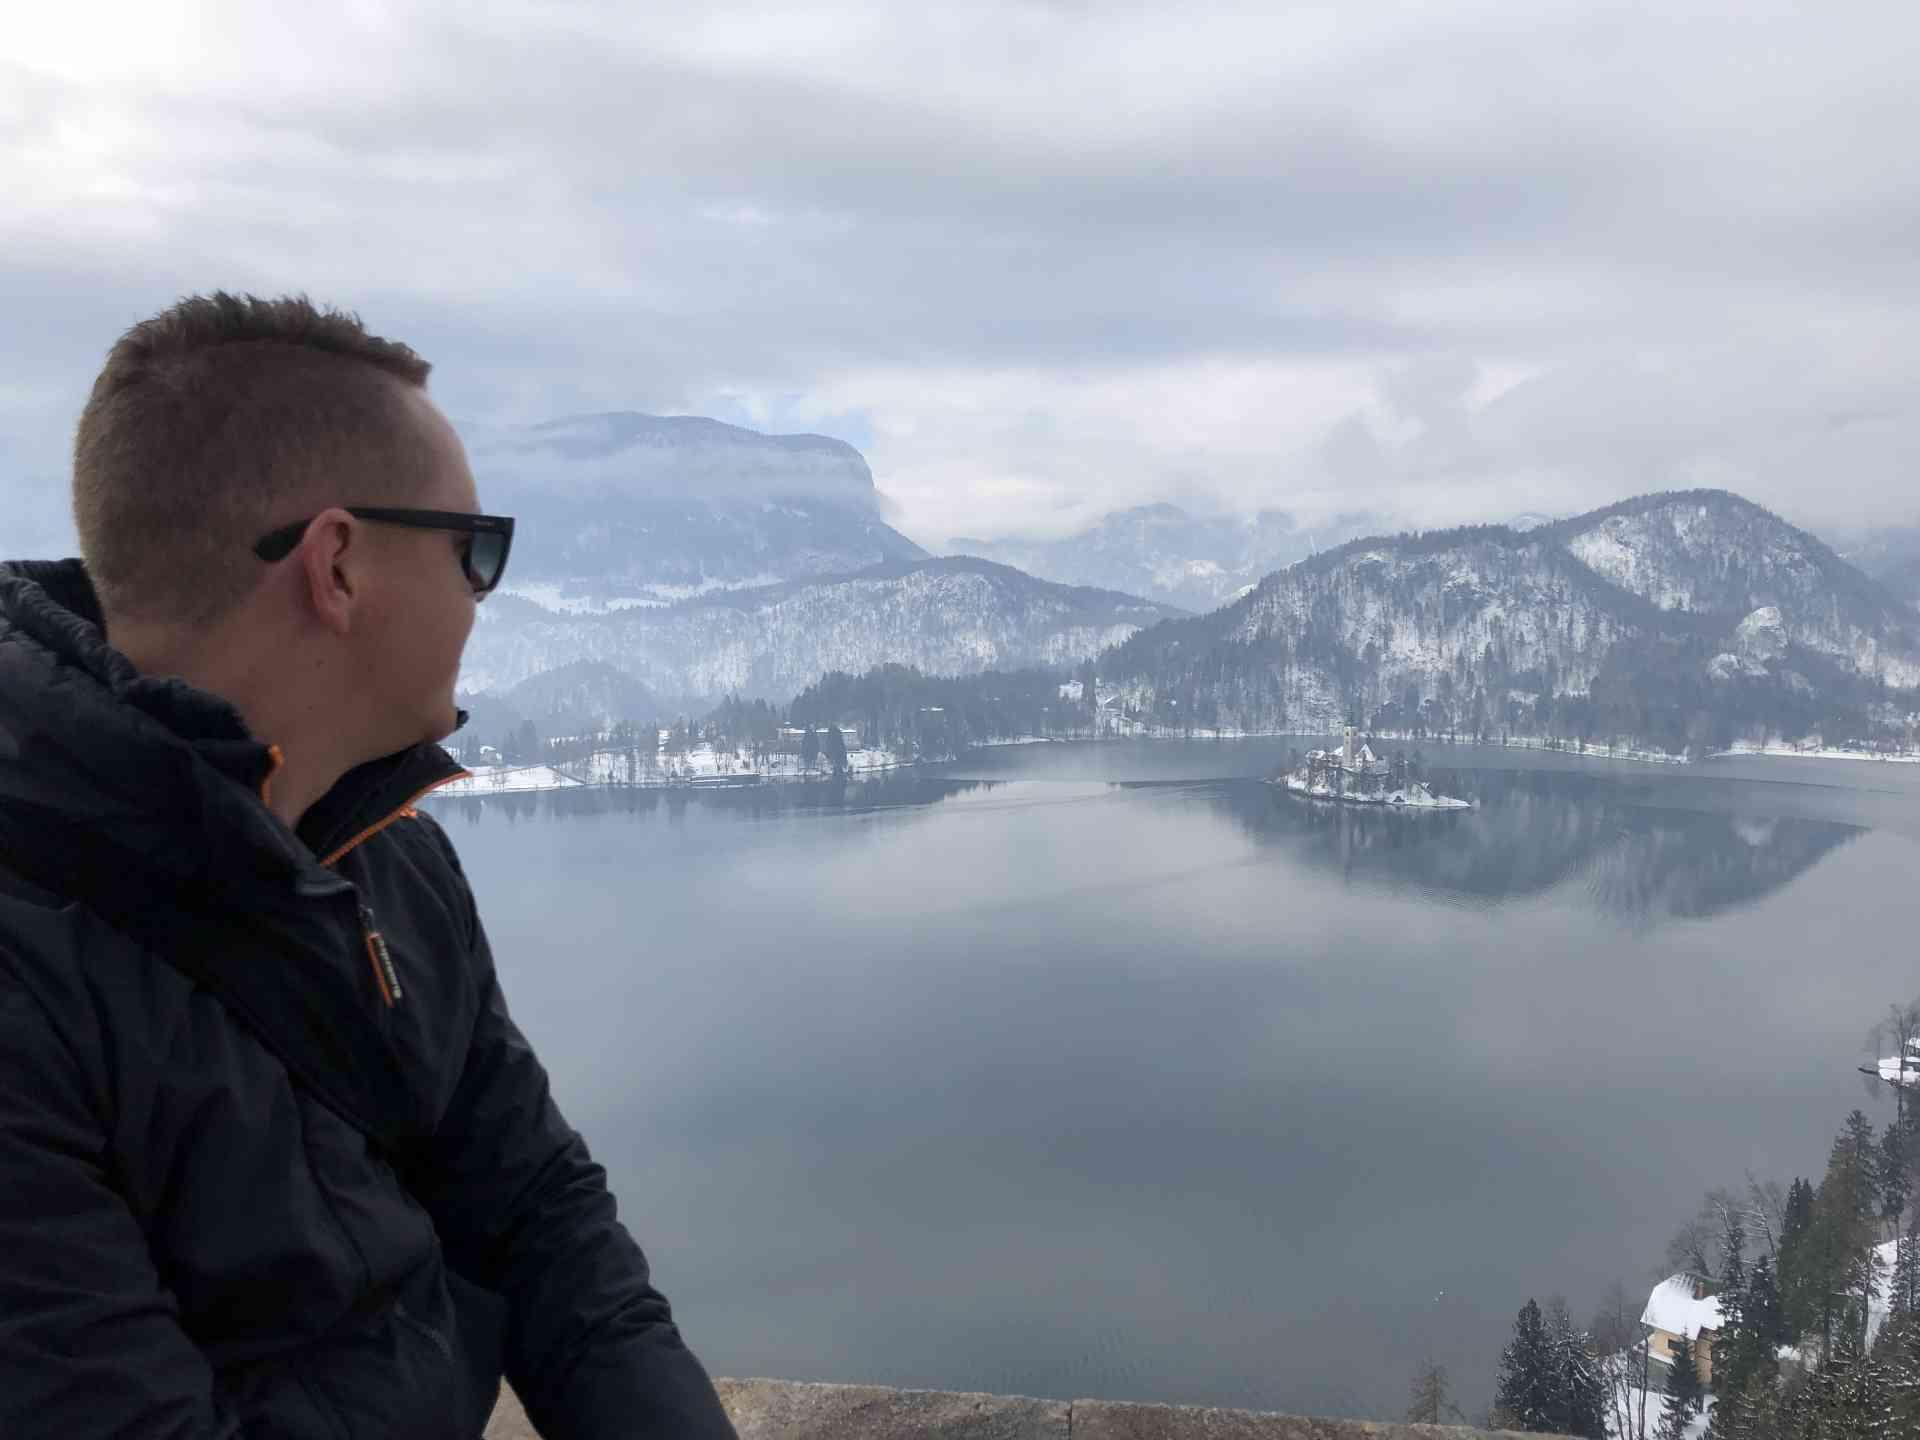 Lake Bled, Slovenia by Adam Dickson